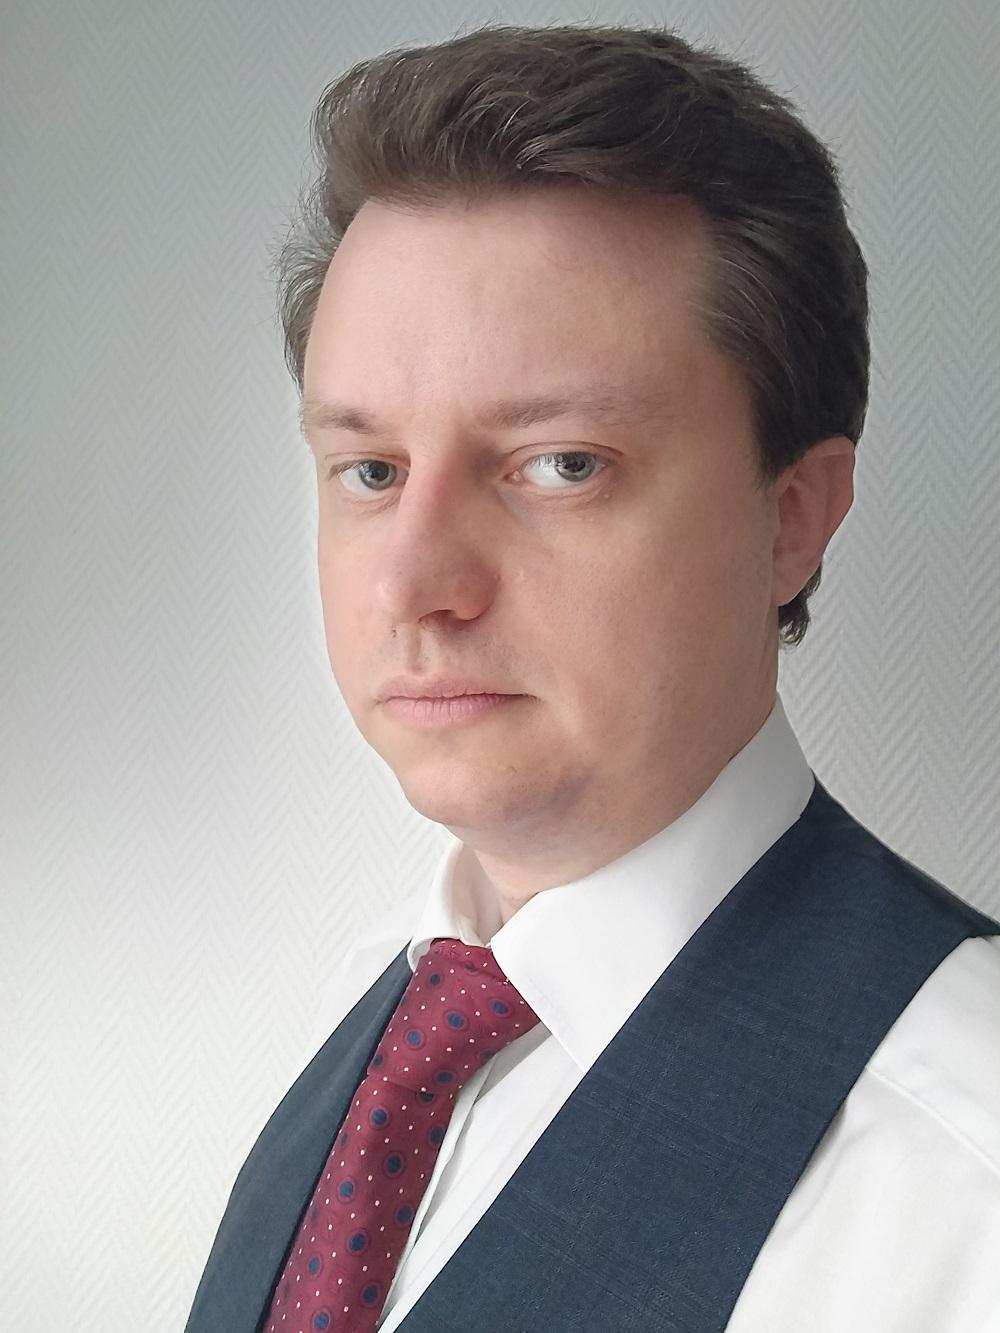 Stpéhane Broquet - avocat fiscaliste immobilier